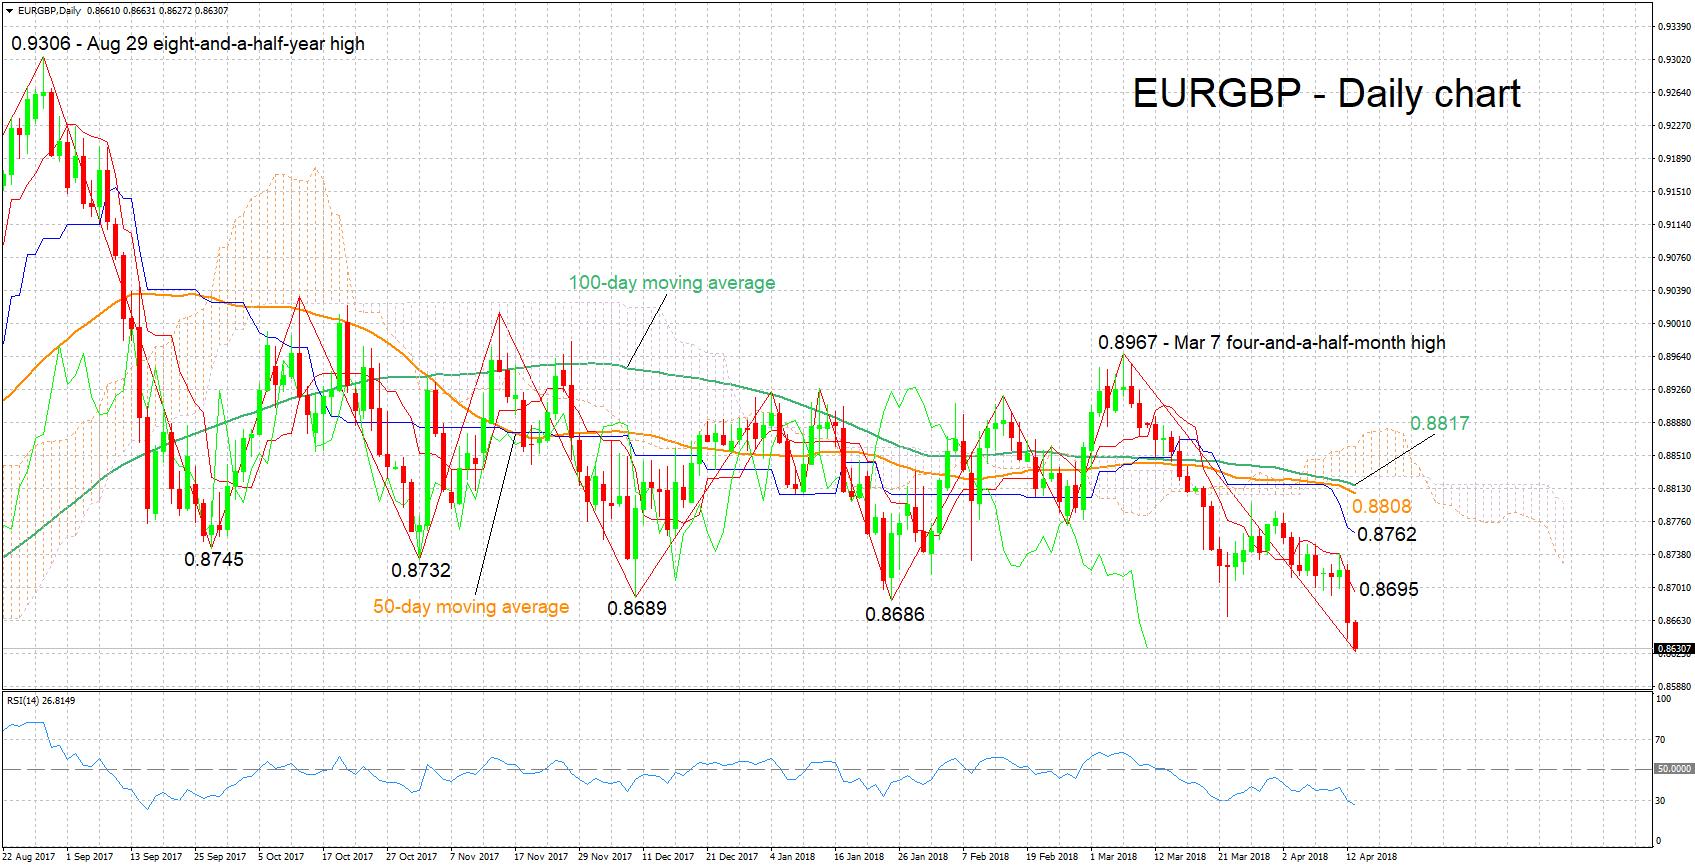 EUR/GBP Forex 13 42018